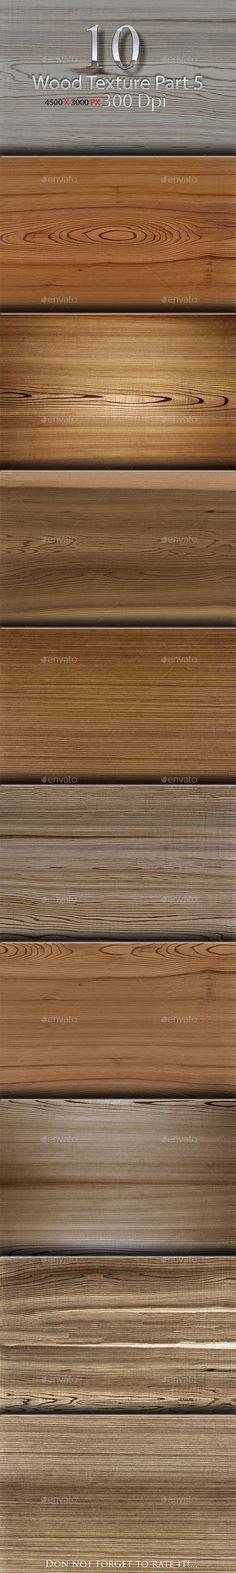 10 Wood Texture Part 5